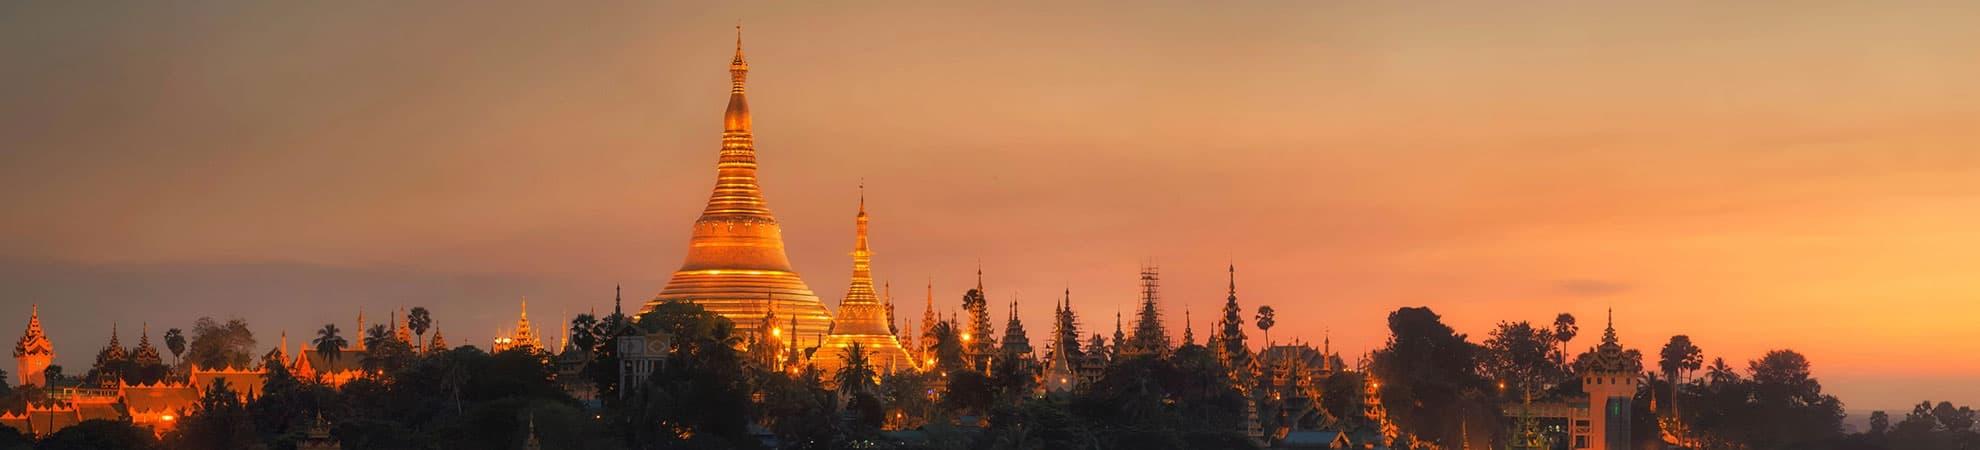 Voyage Yangon (Rangoon)